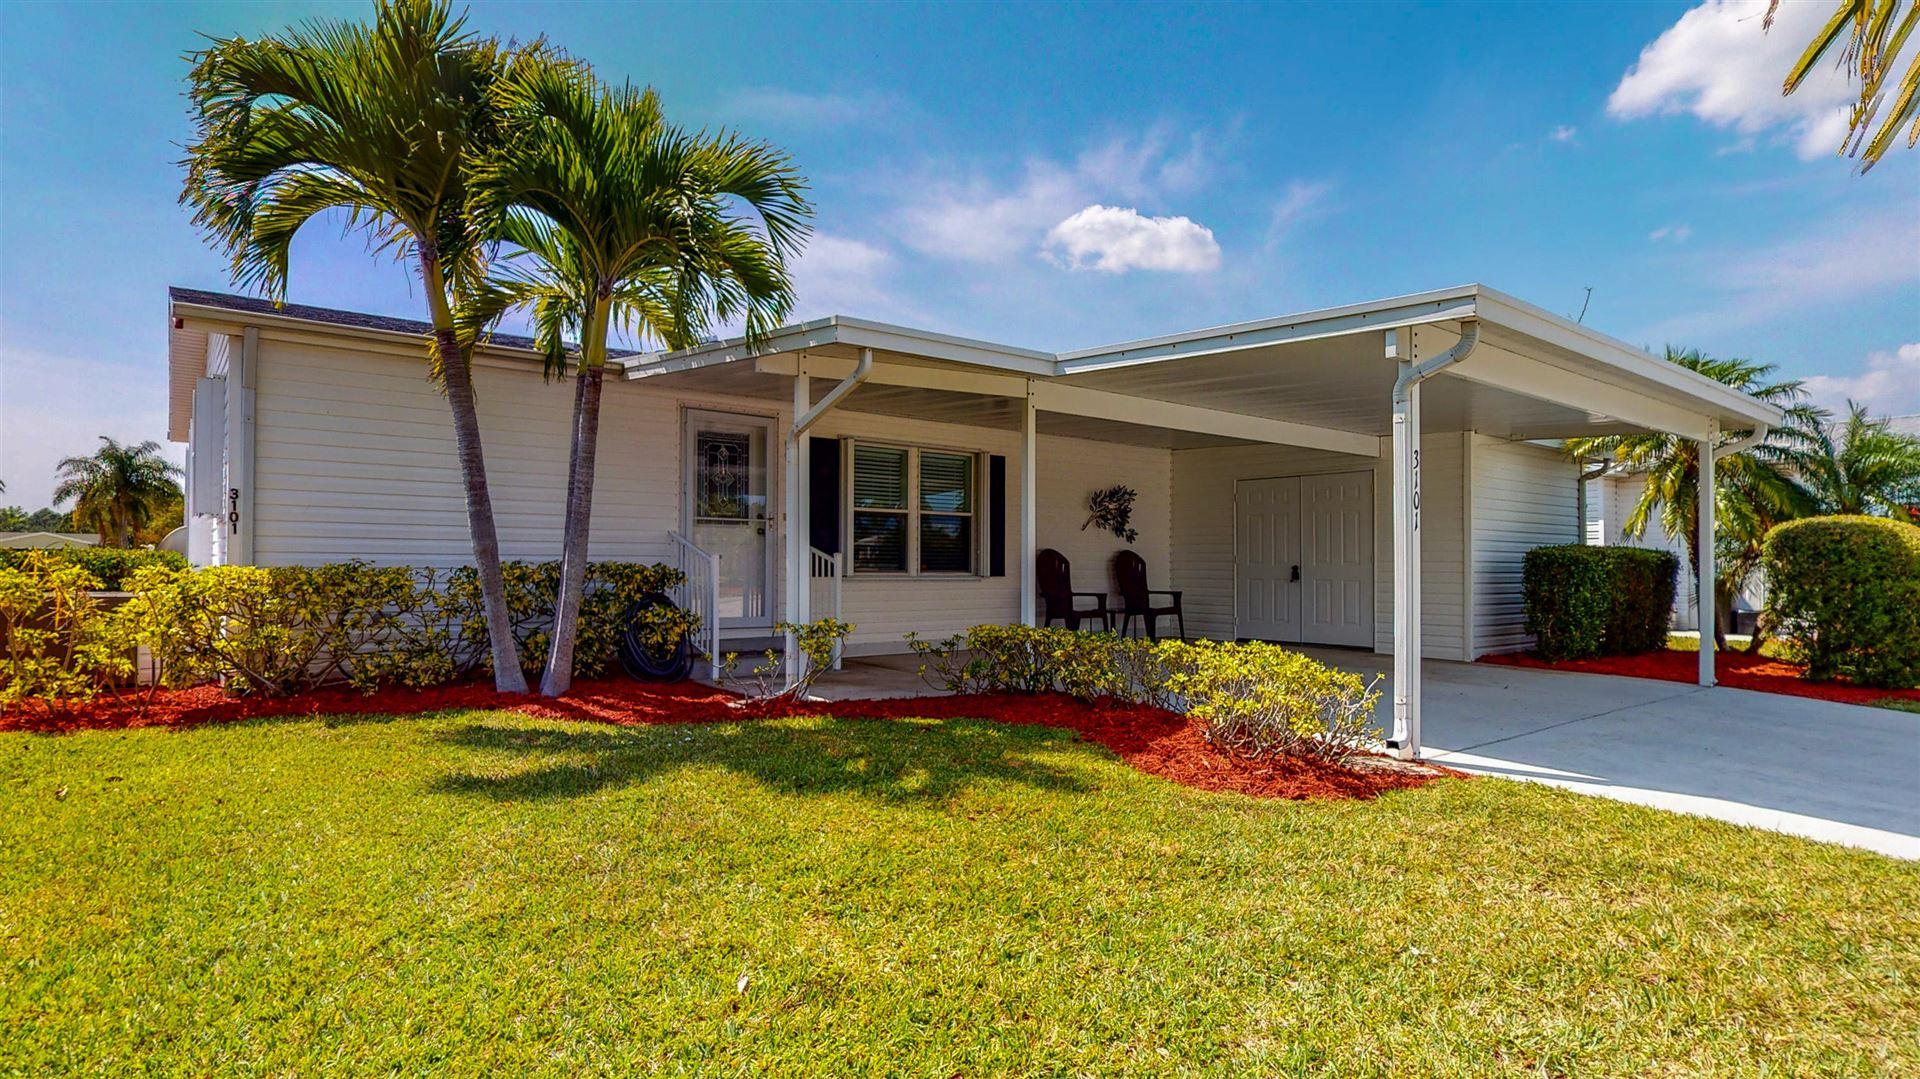 3101 Scarlet Ibis Lane, Port Saint Lucie, FL 34952 - #: RX-10708959